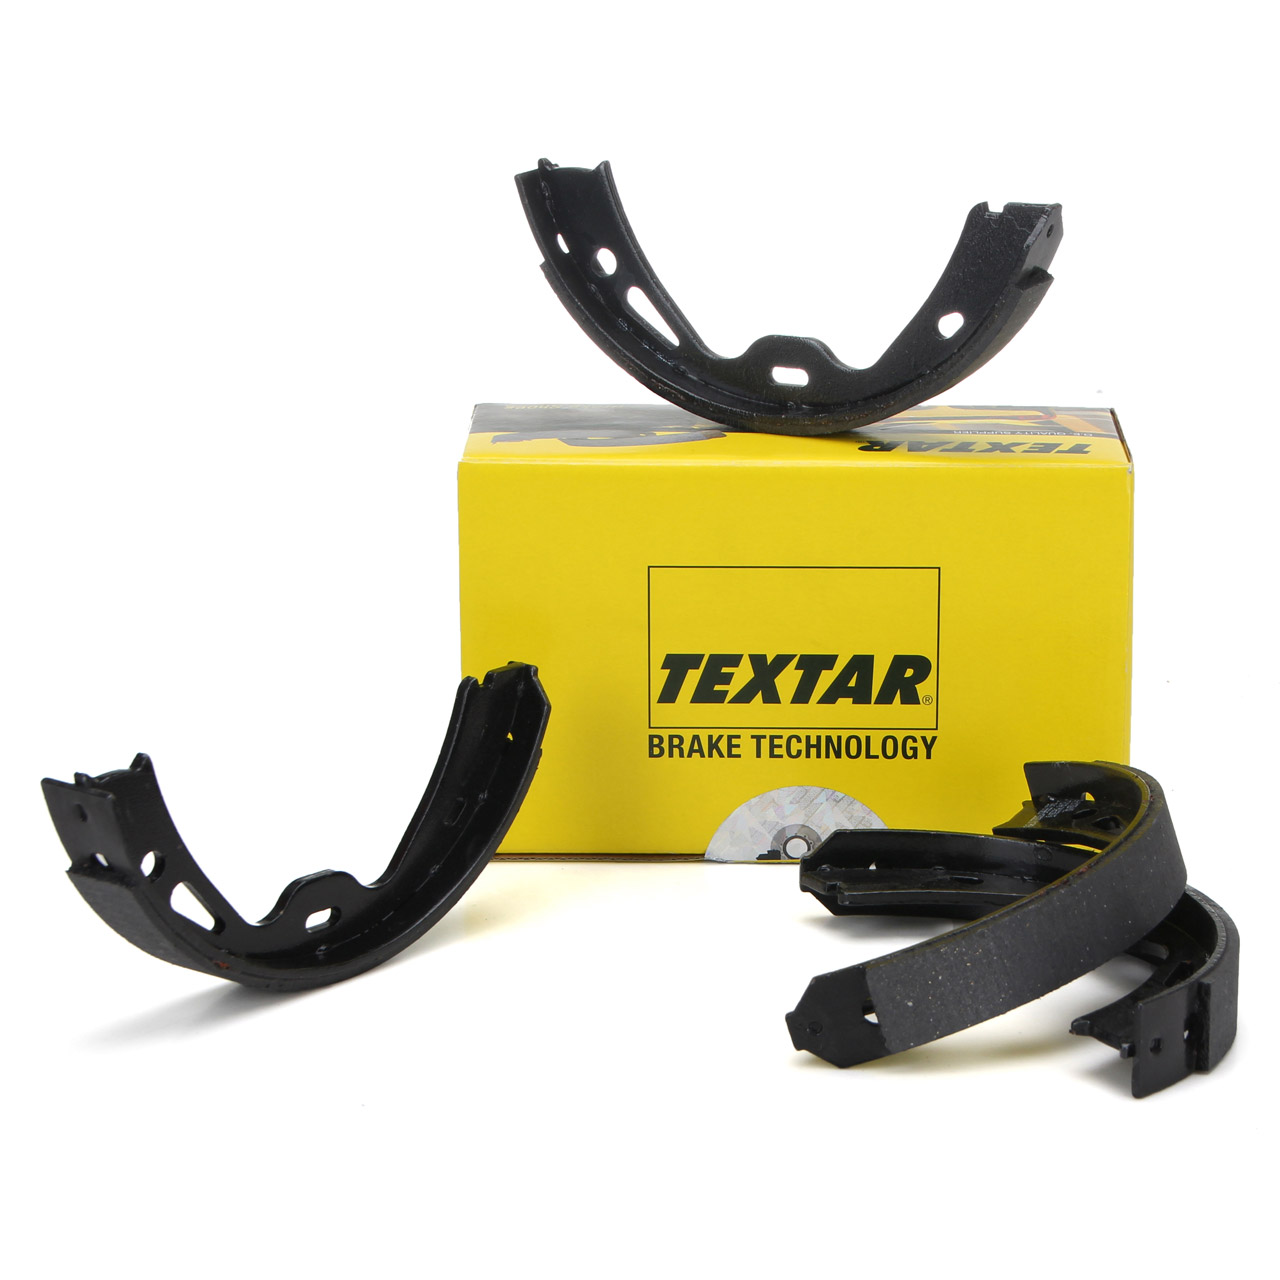 TEXTAR 91063500 Bremsbacken Satz PORSCHE 964 993 996 997 924 928 944 Boxster Cayman